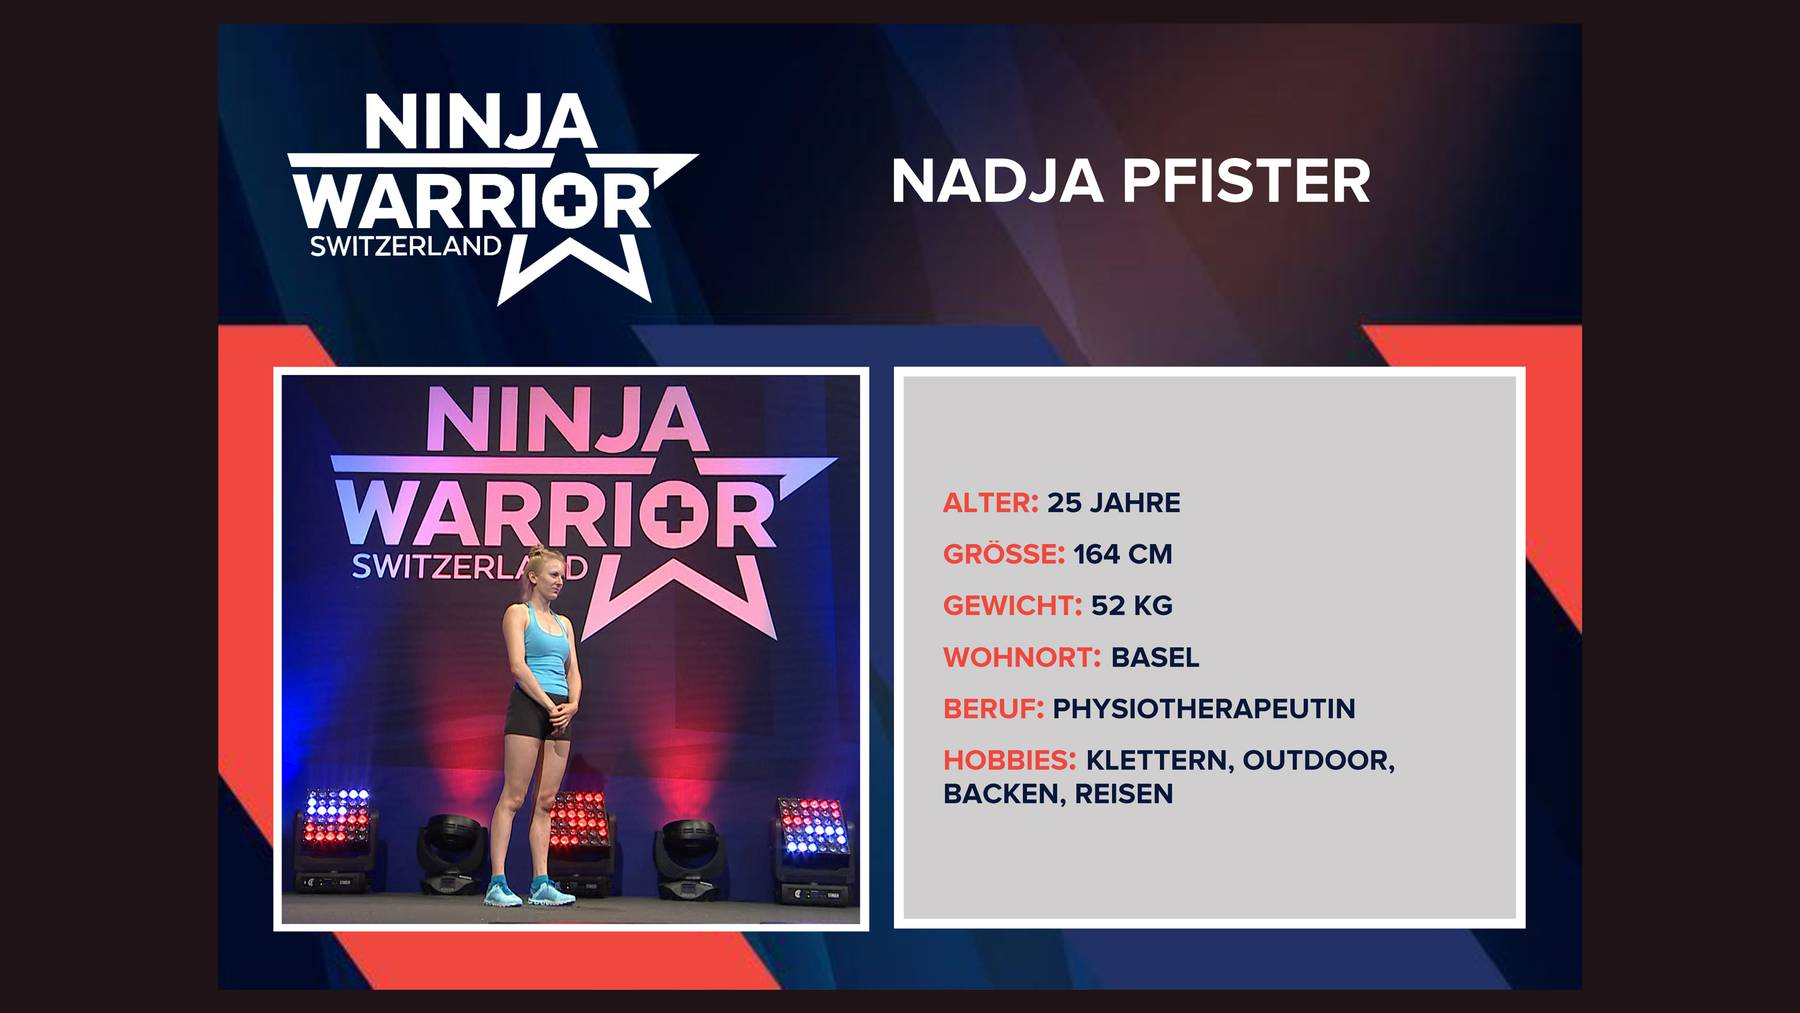 Nadja Pfister